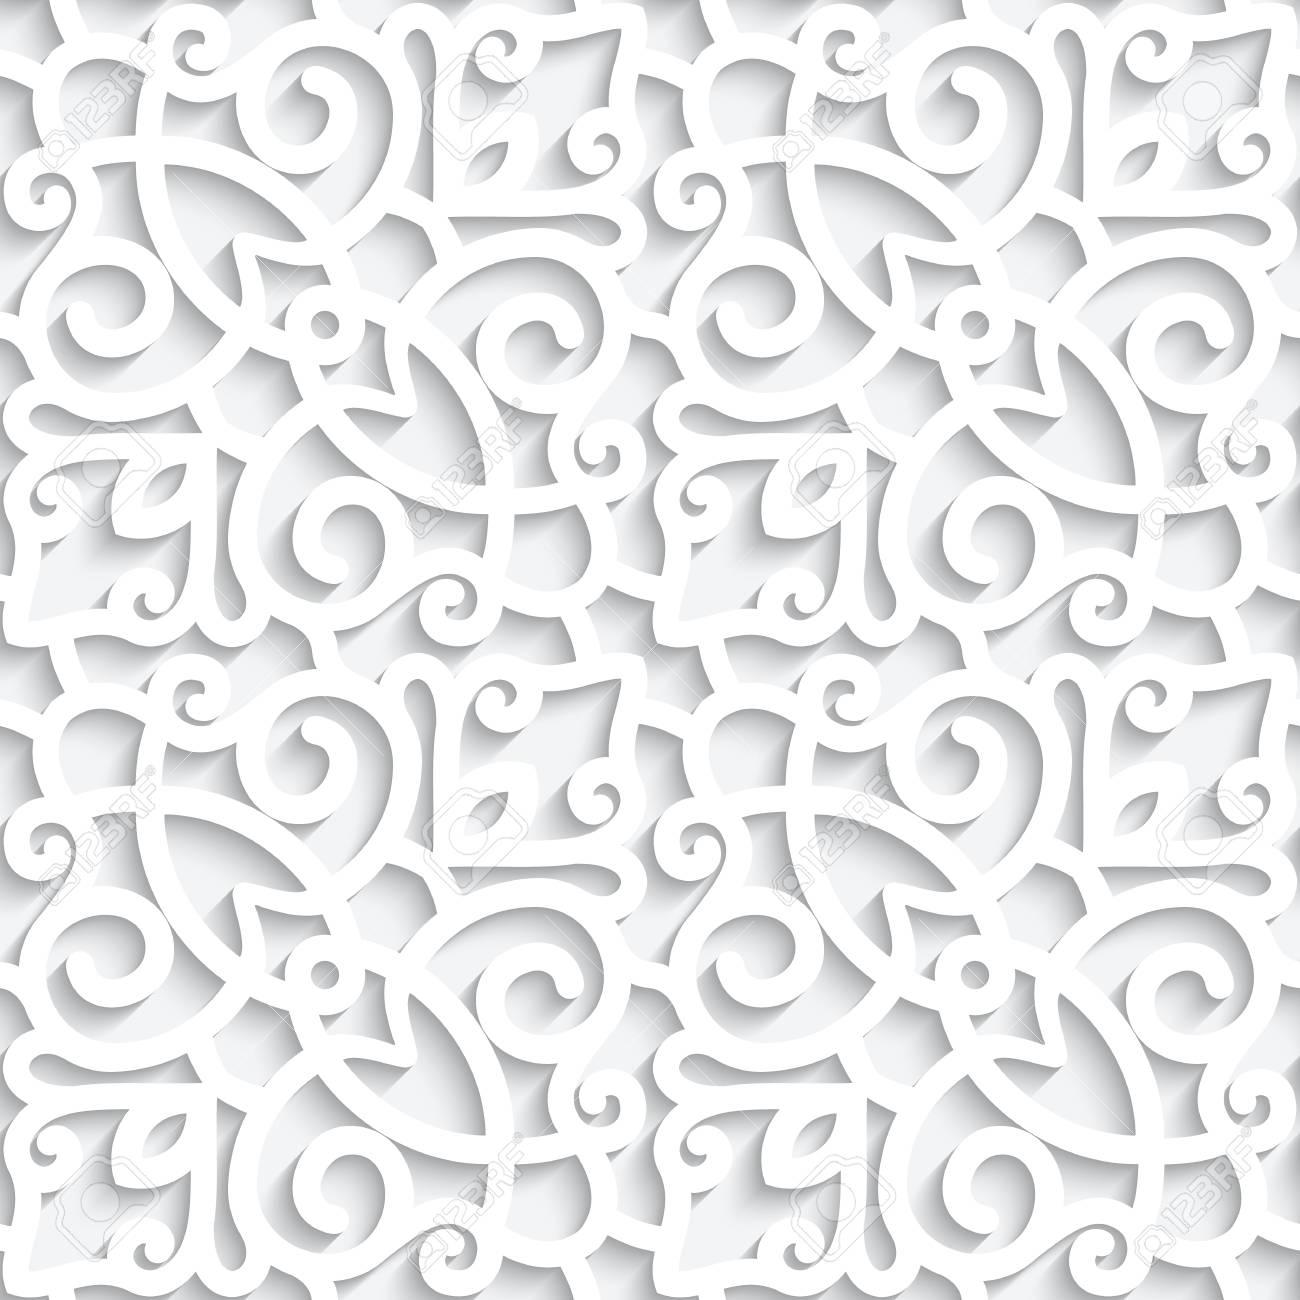 White lace texture, seamless pattern with cutout paper swirls - 121113649